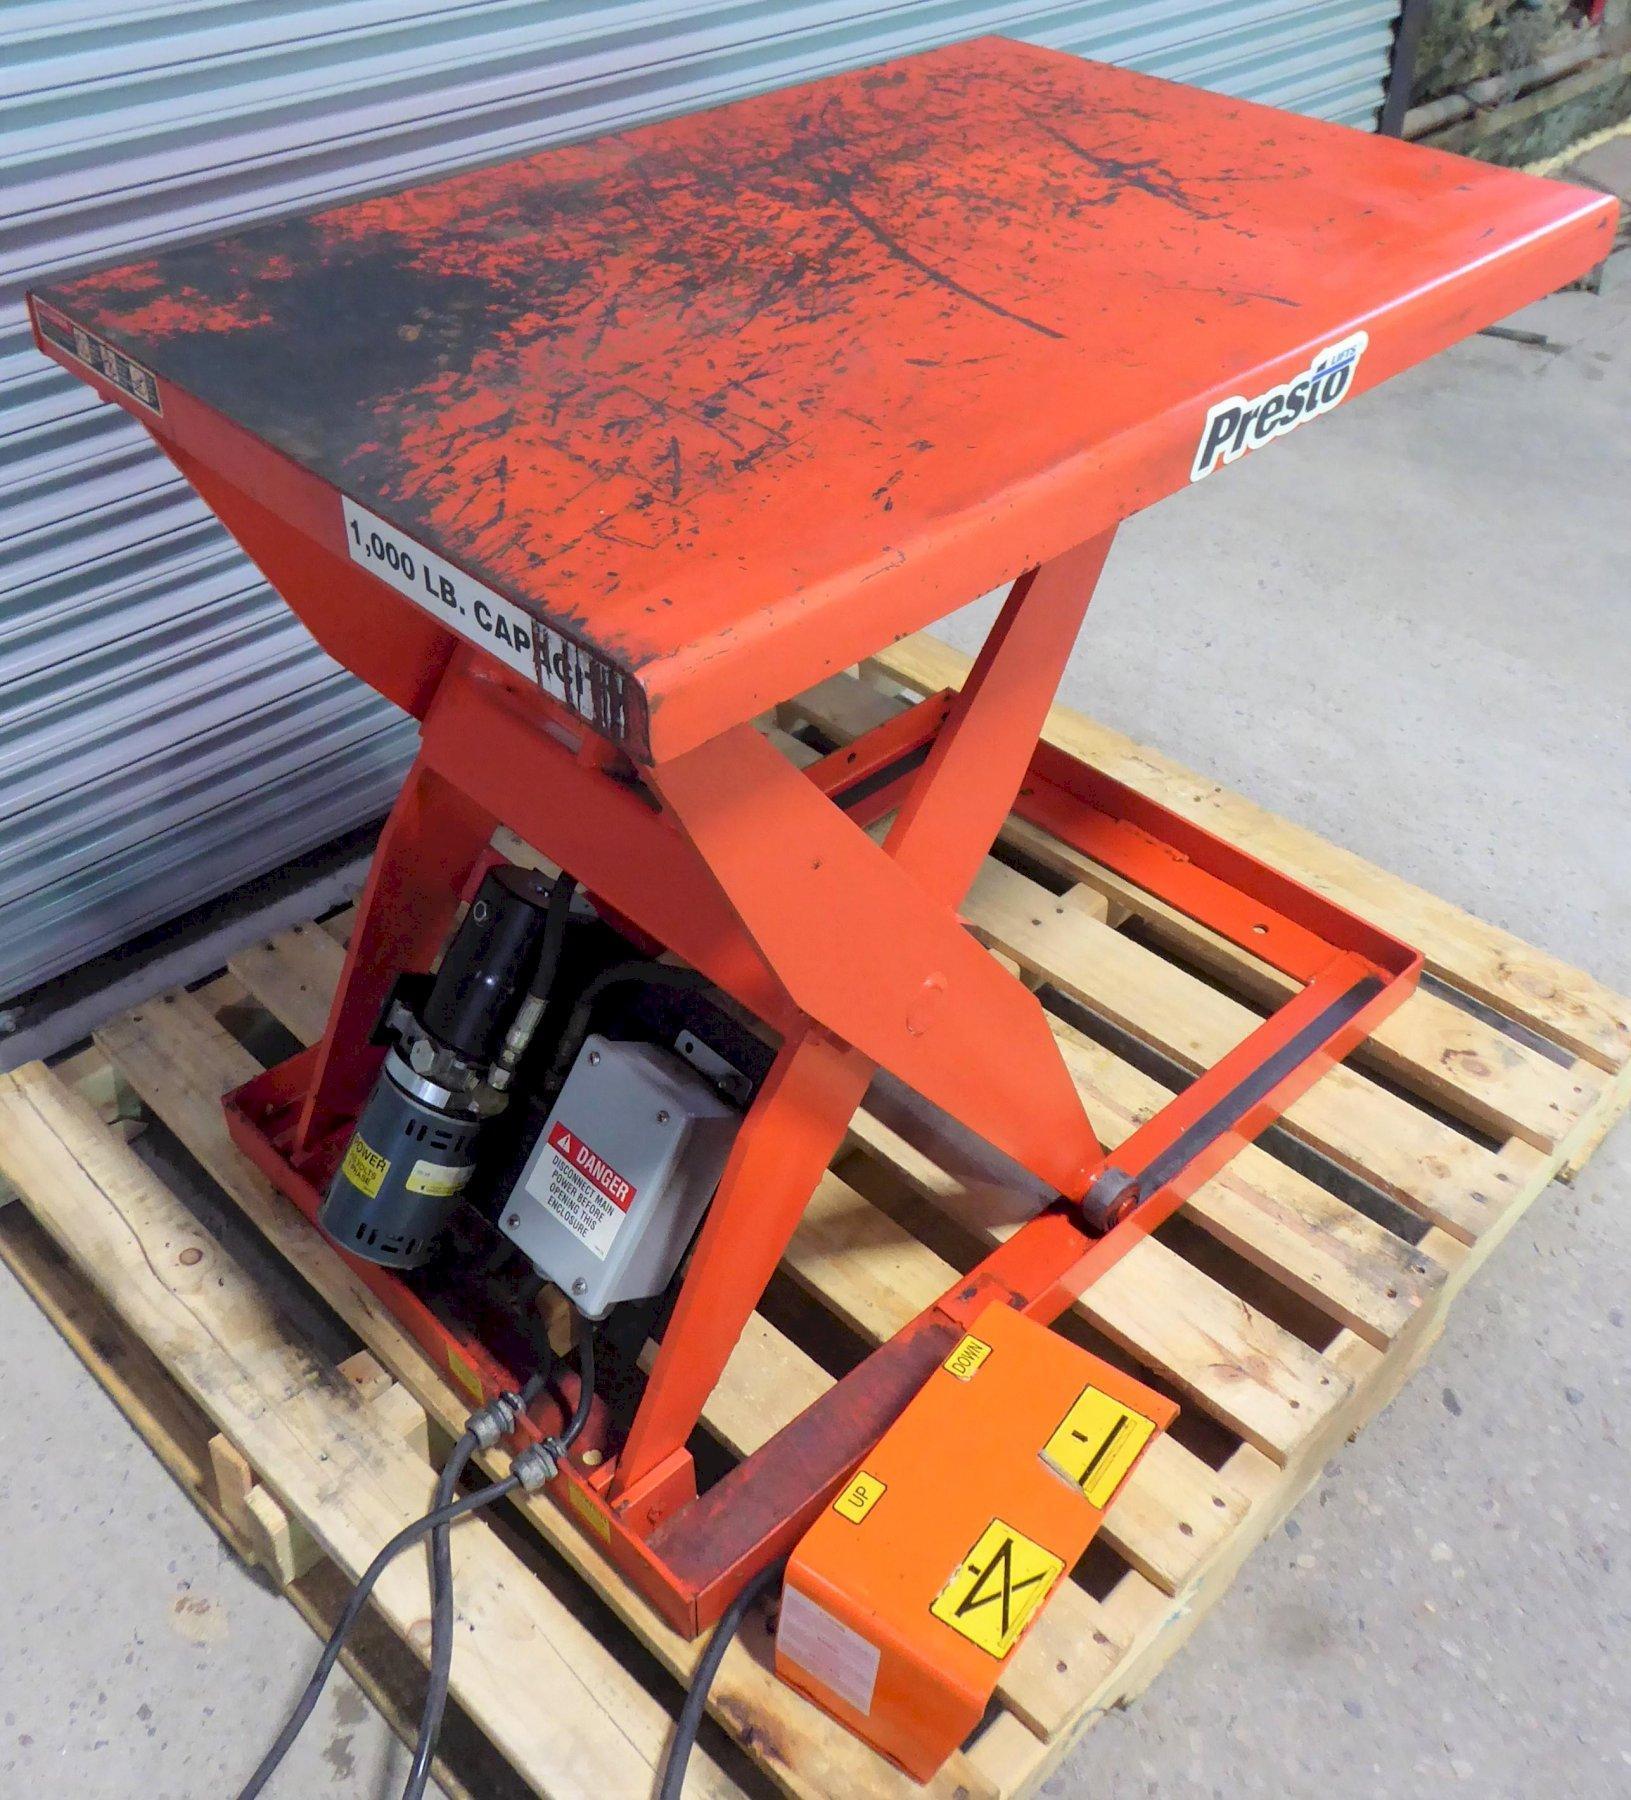 1000 Lb. Presto Scissor Lift Table, Hydraulic, 24″ x 36″ Platform, 1 Phase